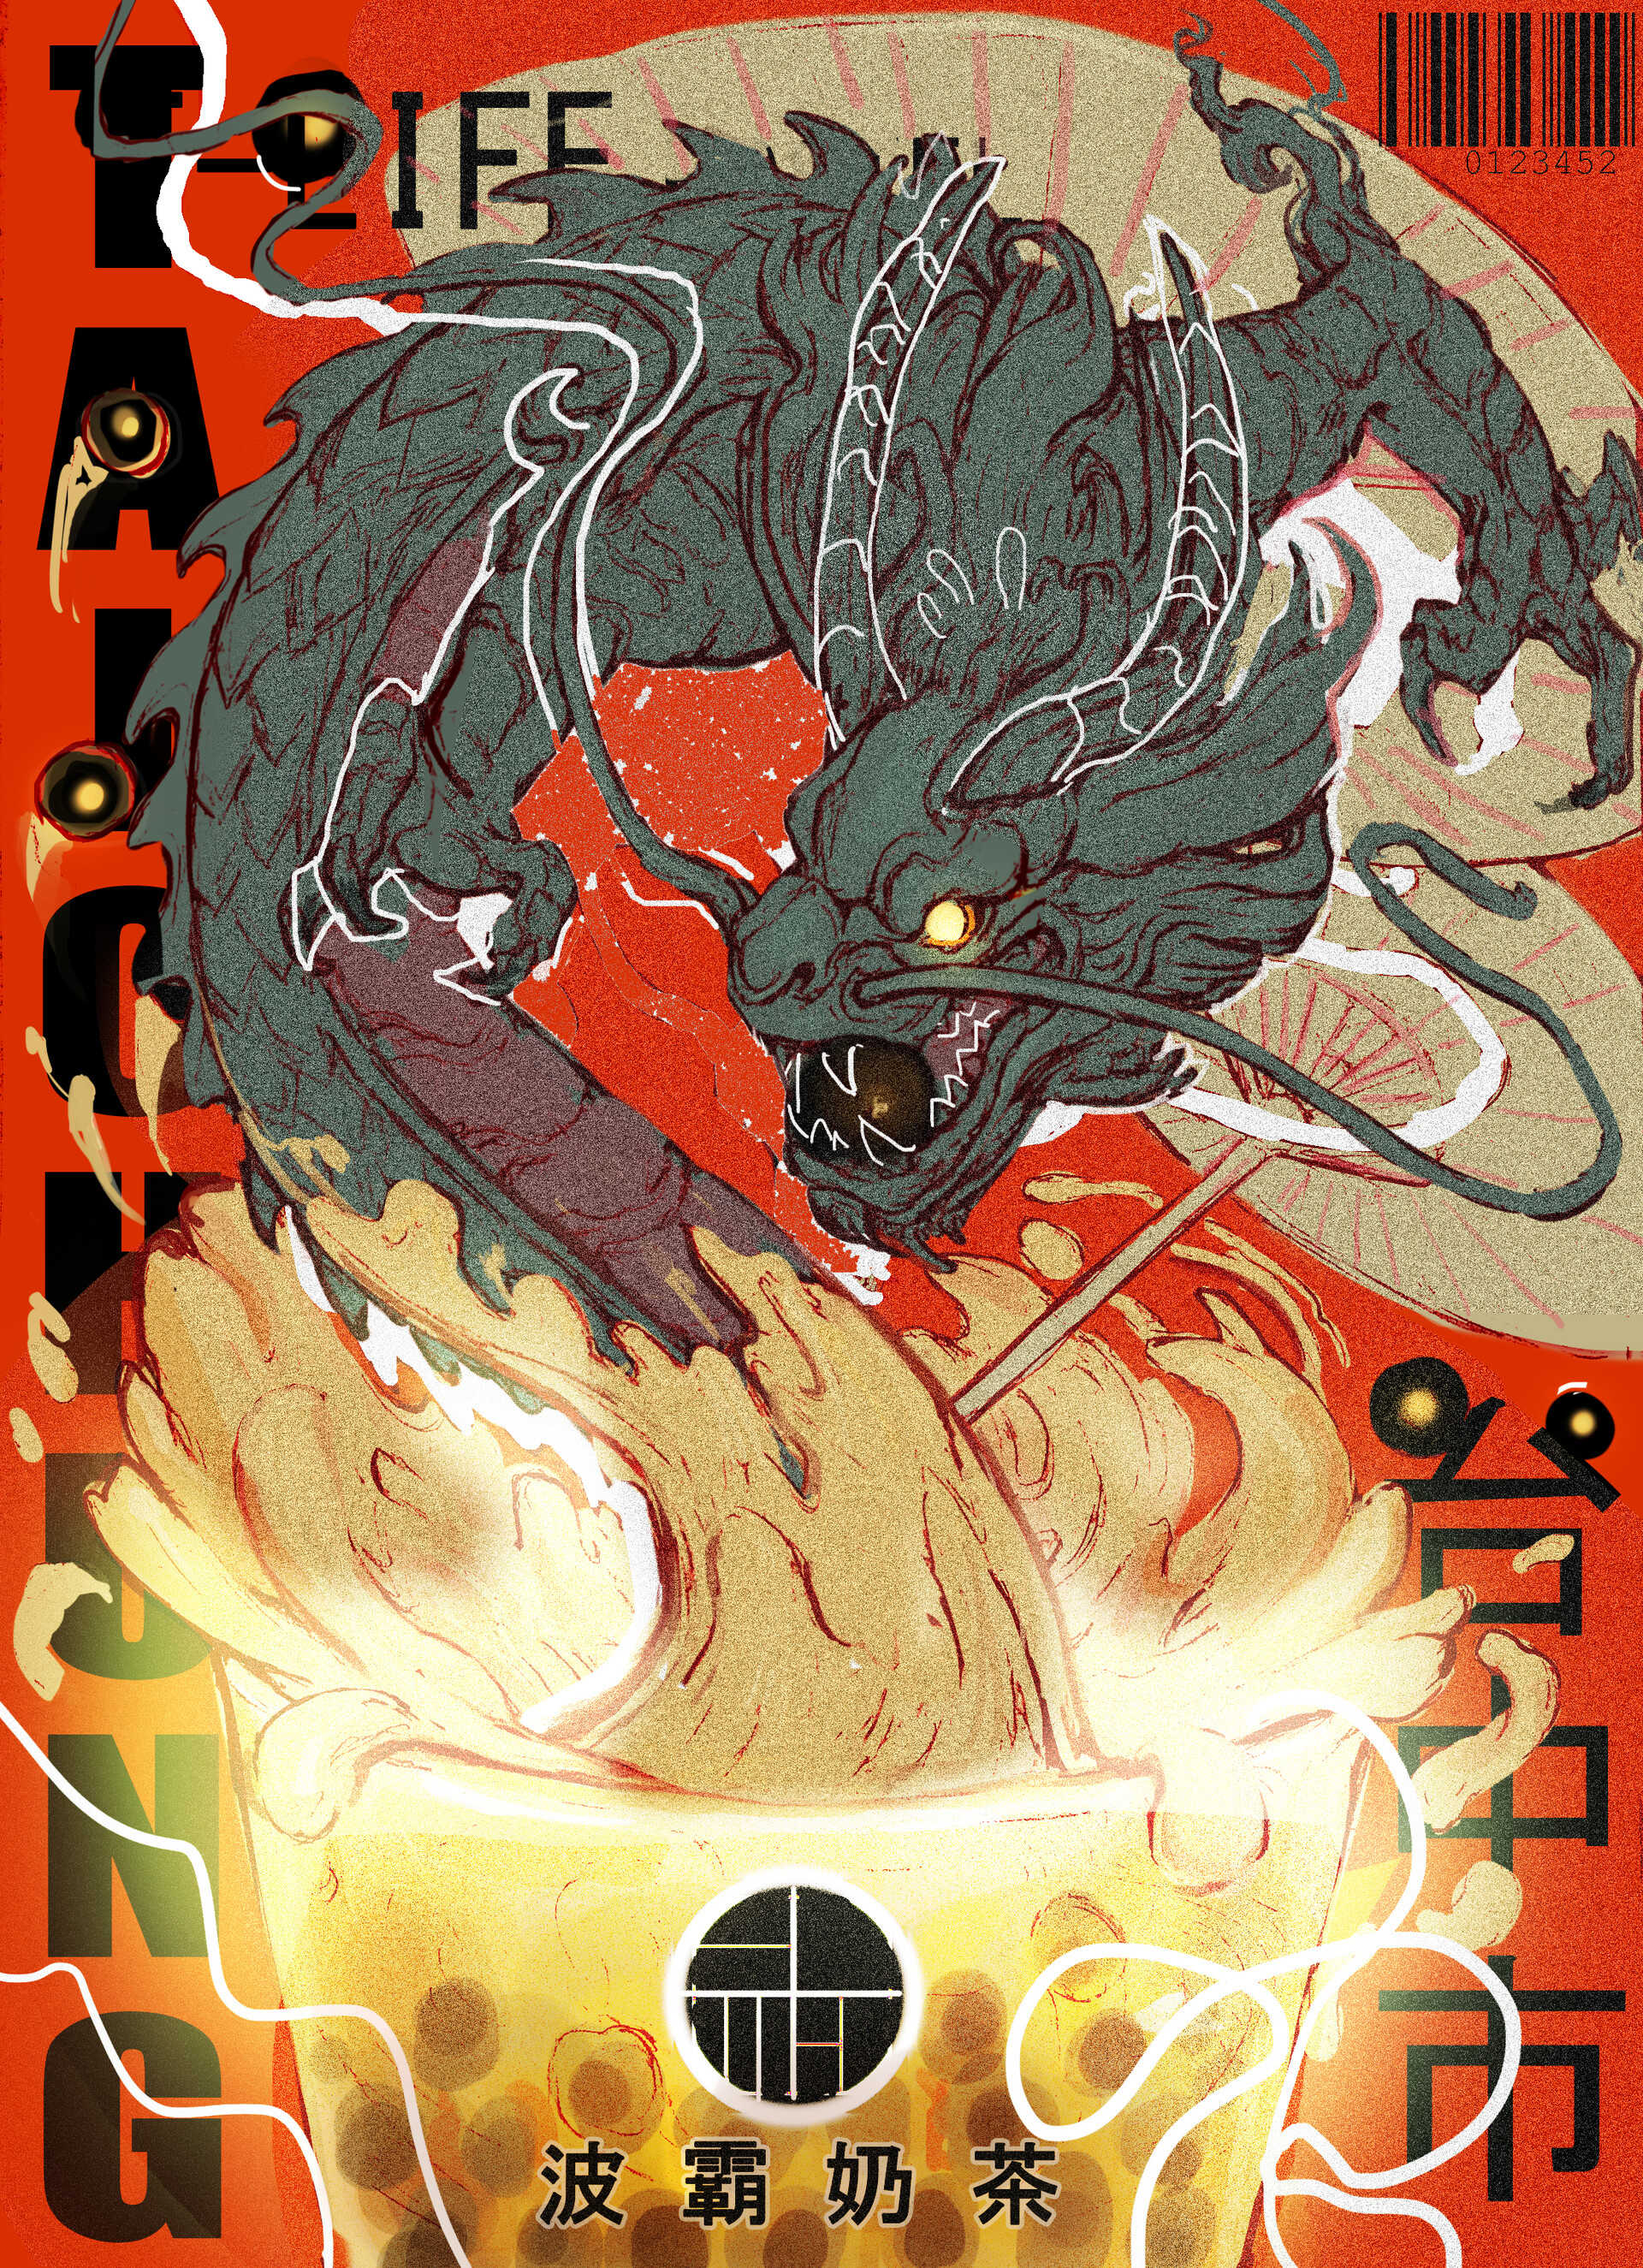 Francisco matos dragon24f